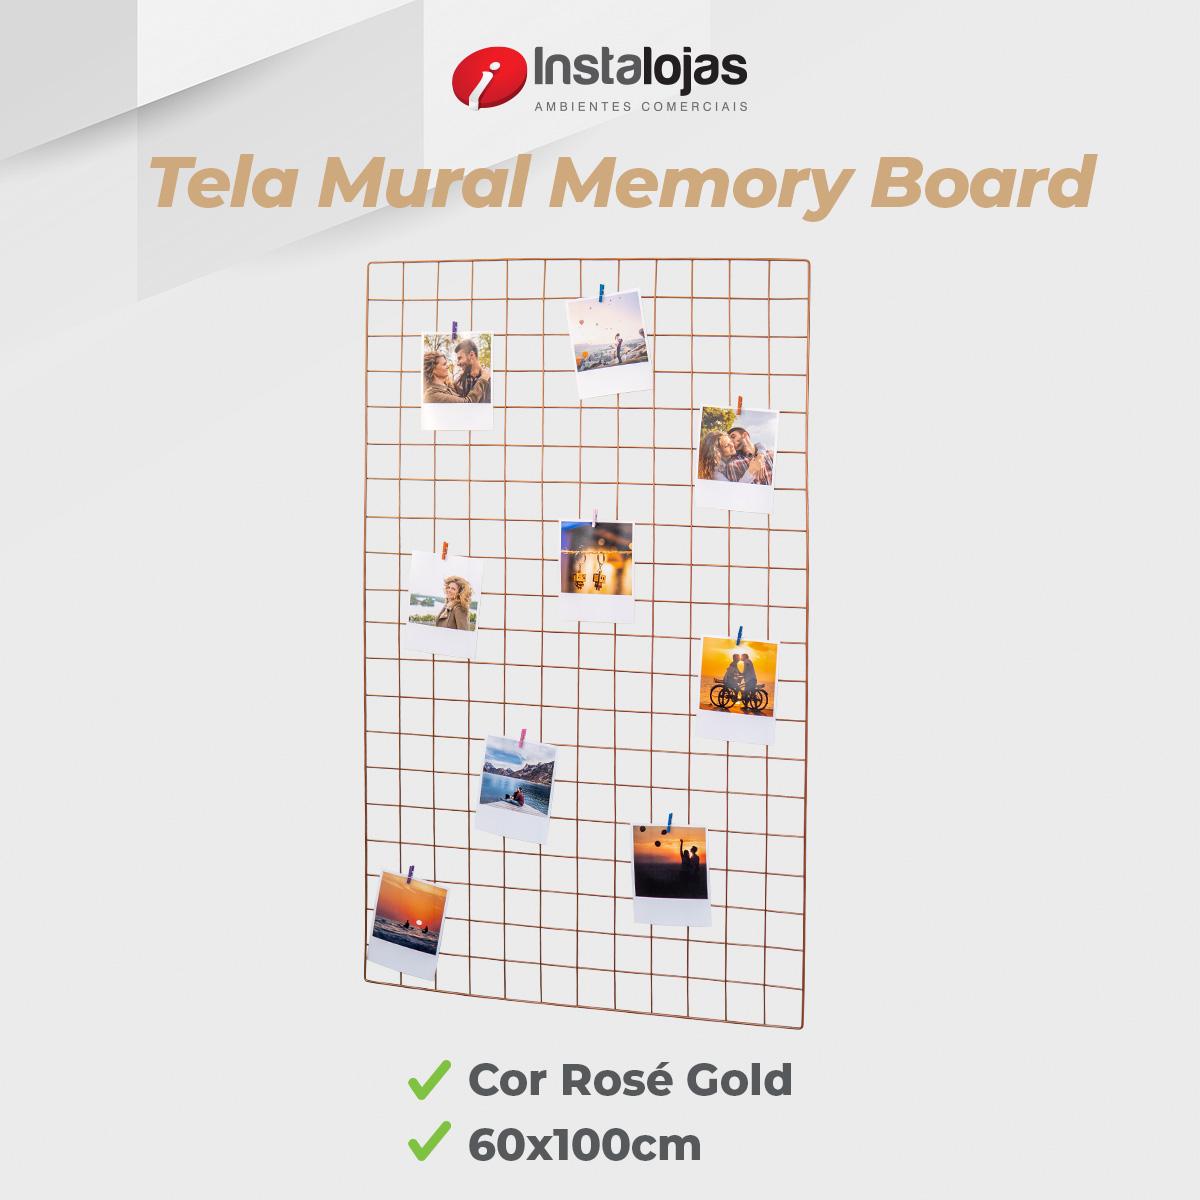 Kit Tela 60x100cm Rosé Gold + 10 Prendedores Cores Sortidas